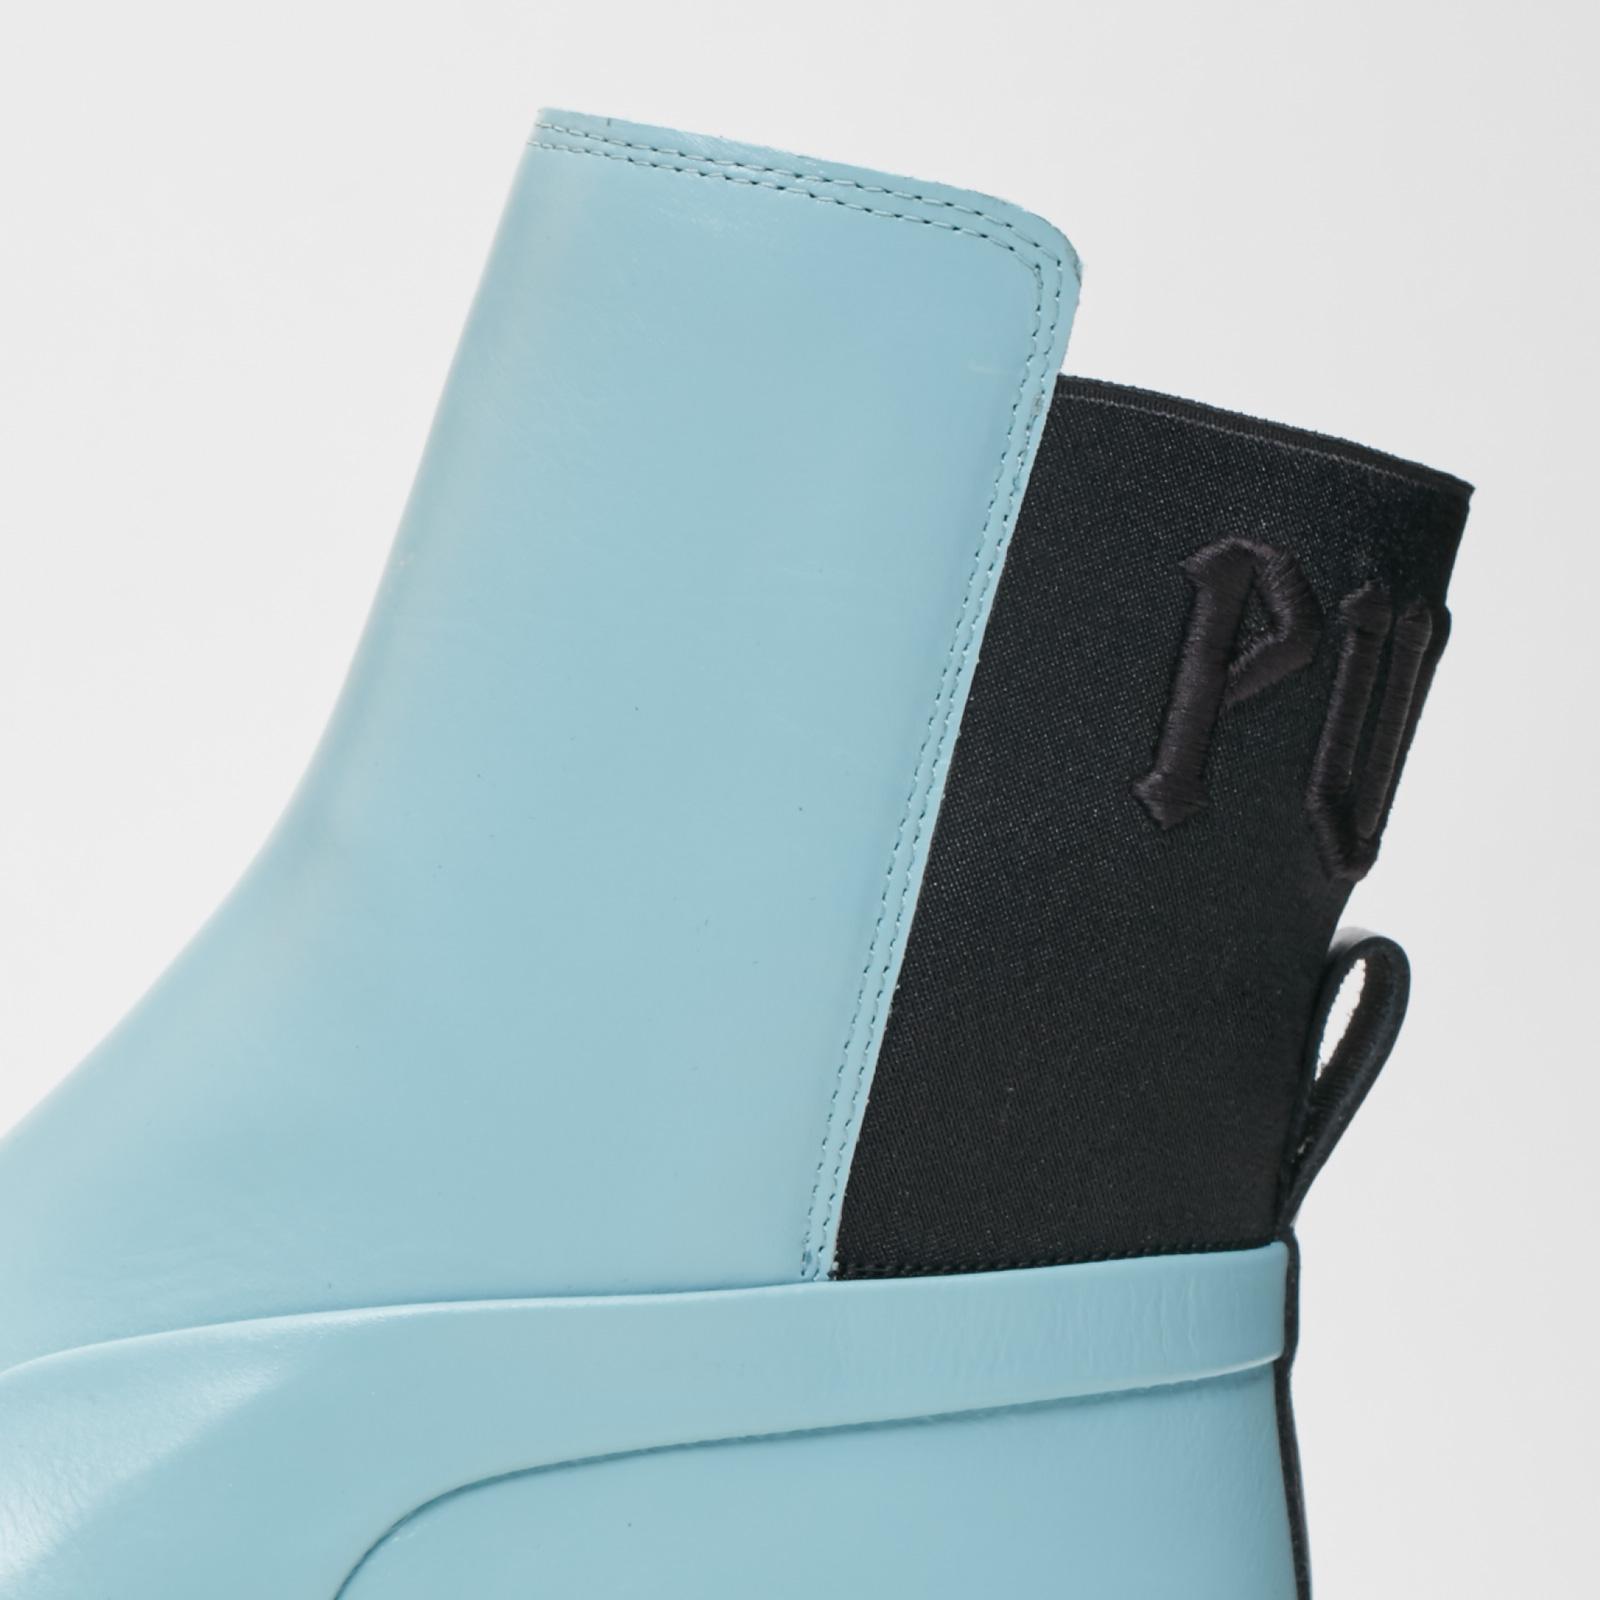 57687ad5d06 Puma Chelsea Sneaker Boot Wns - 366266-01 - Sneakersnstuff ...